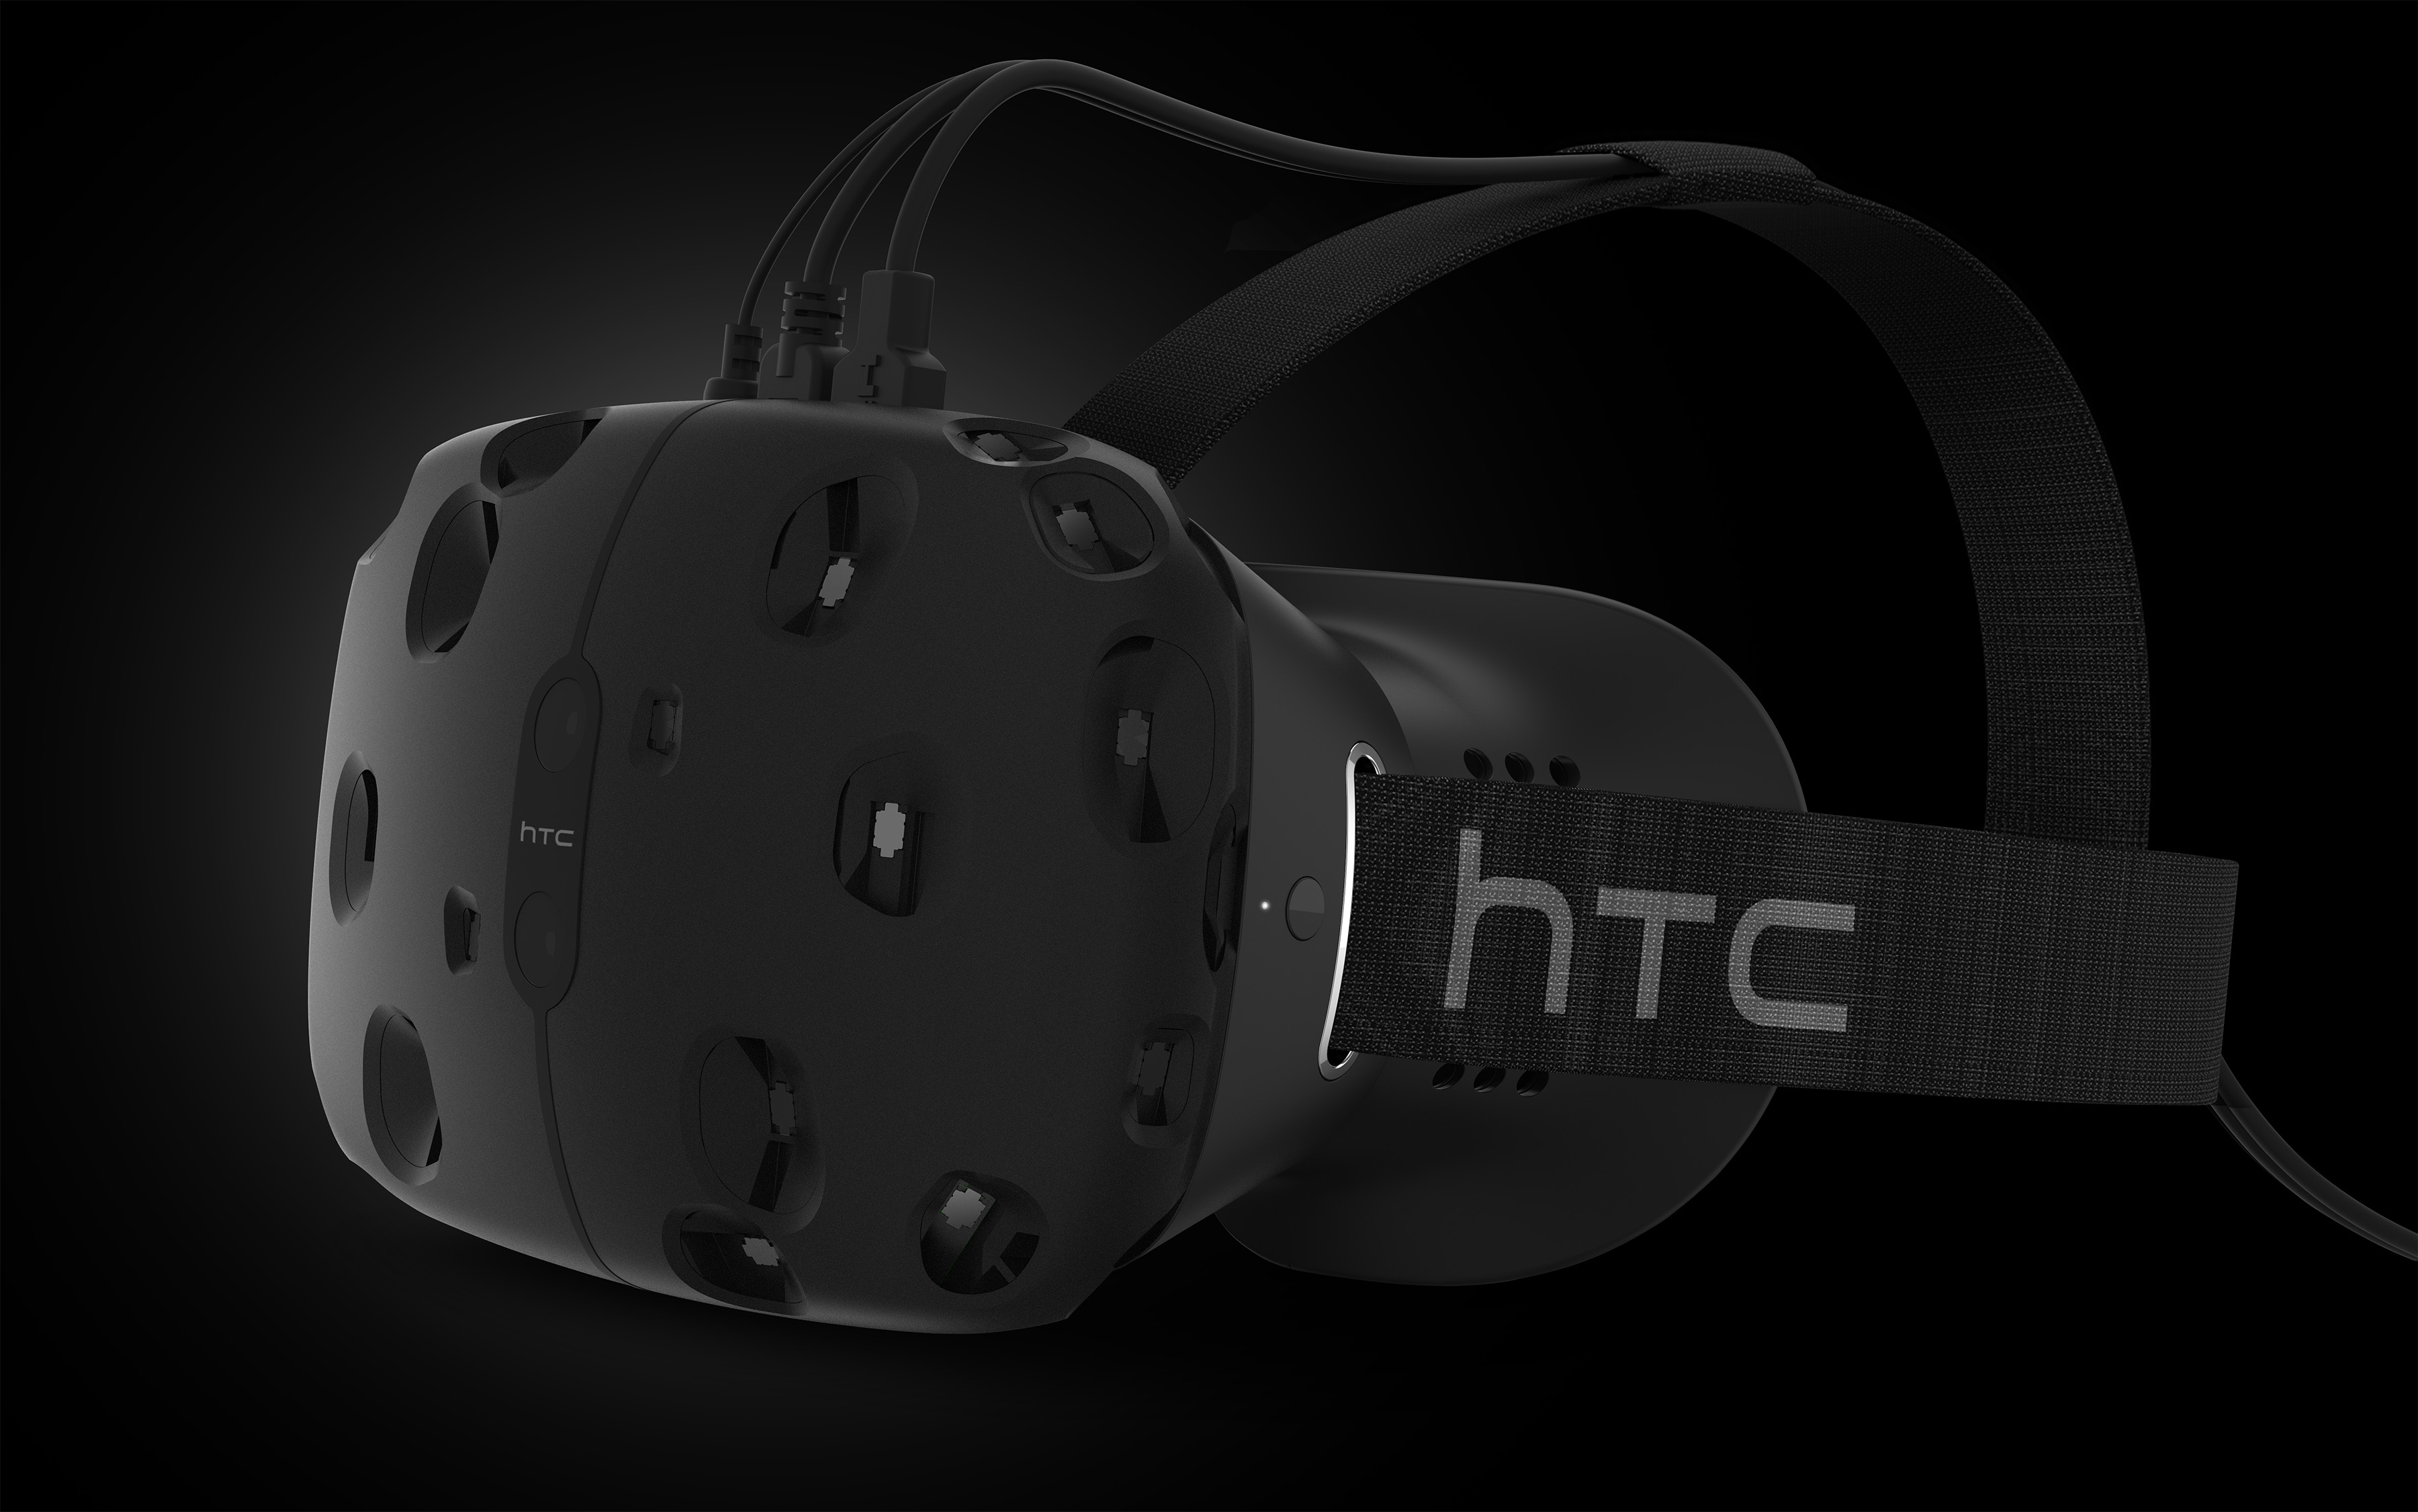 HTC's take on Steam VR.